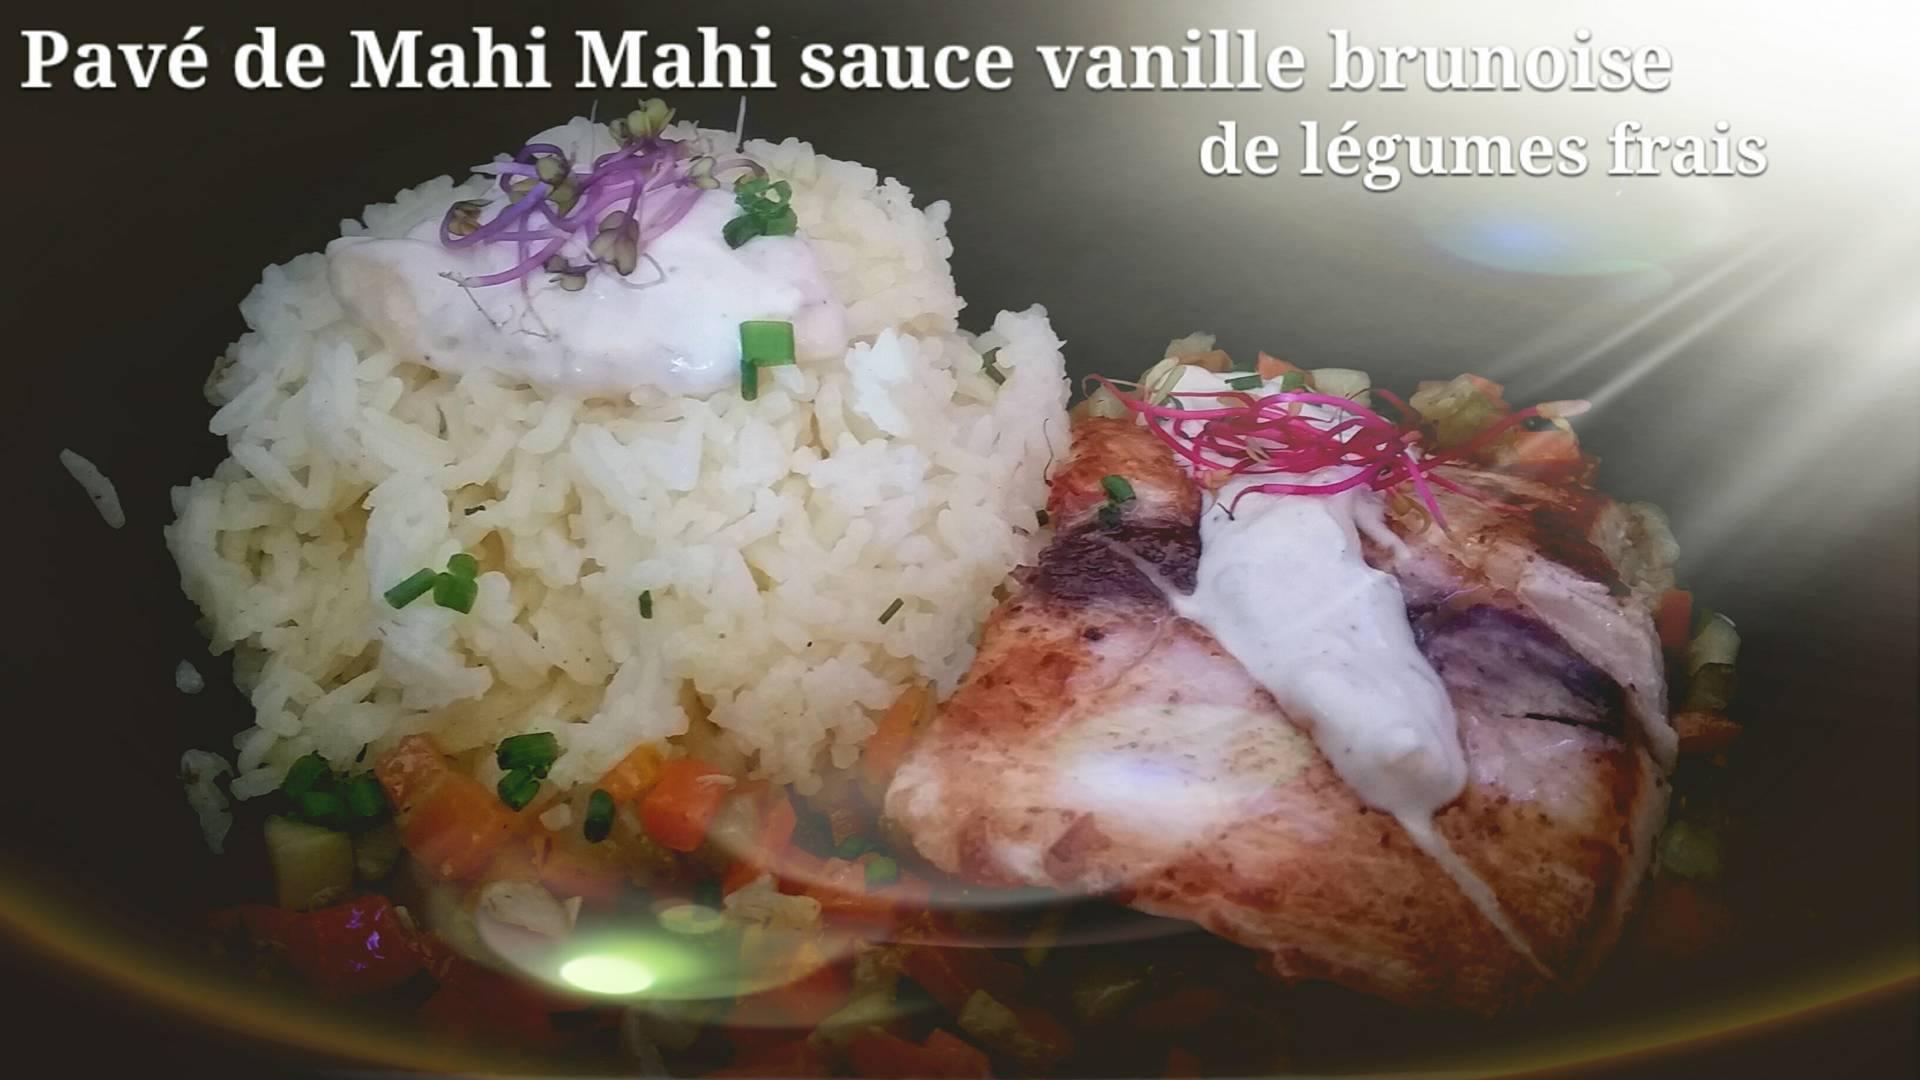 pavé_de_Mahi_Mahi_sauce_Vanille_de_Tahiti_brunoise_de_légumes_frais